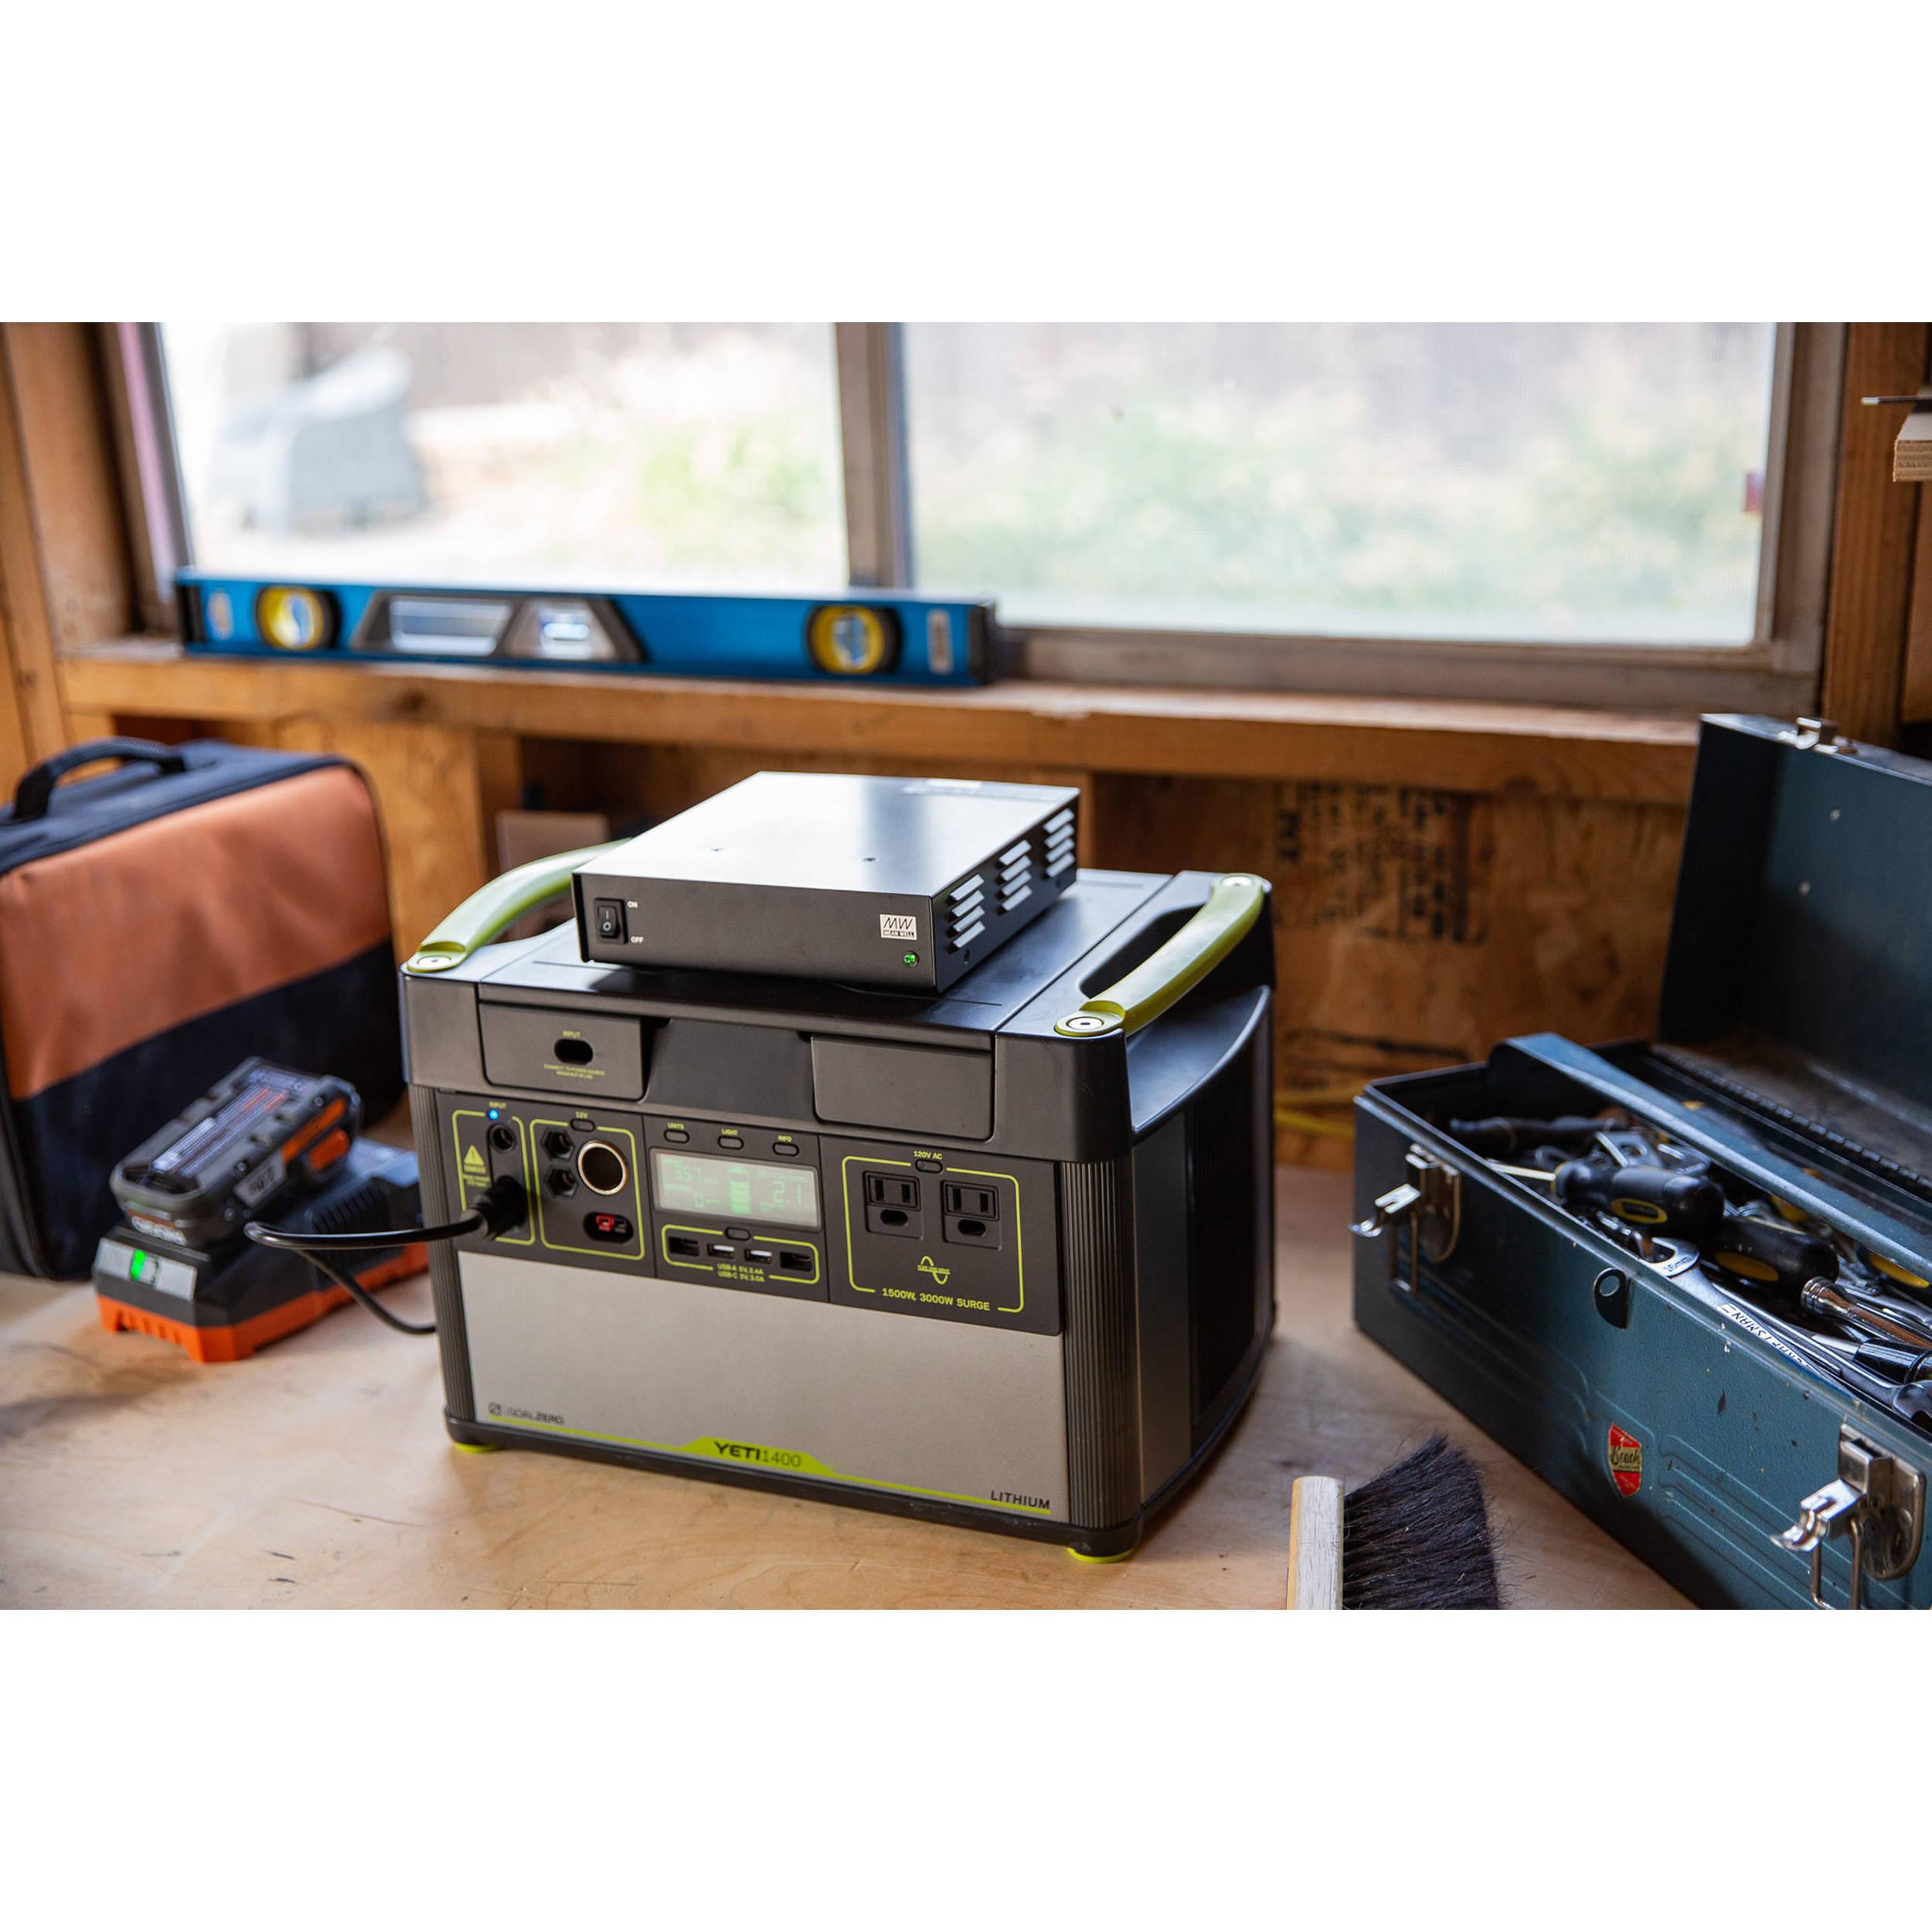 GOAL ZERO 25 AMP Fast Charge AC Power Supply 98080 B&H Photo